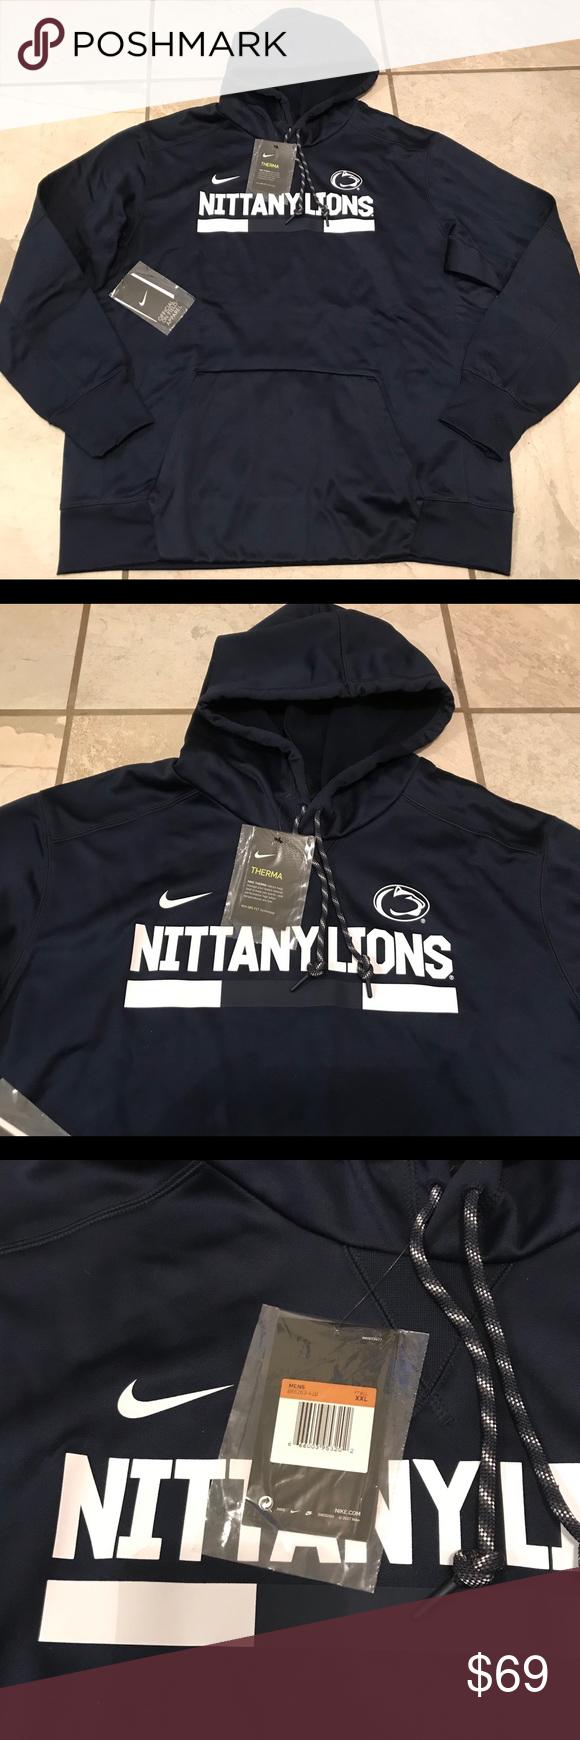 Nike On Field Penn State Nittany Lions Hoodie Penn State Nittany Lions Hoodie Brands Blue Nike [ 1740 x 580 Pixel ]